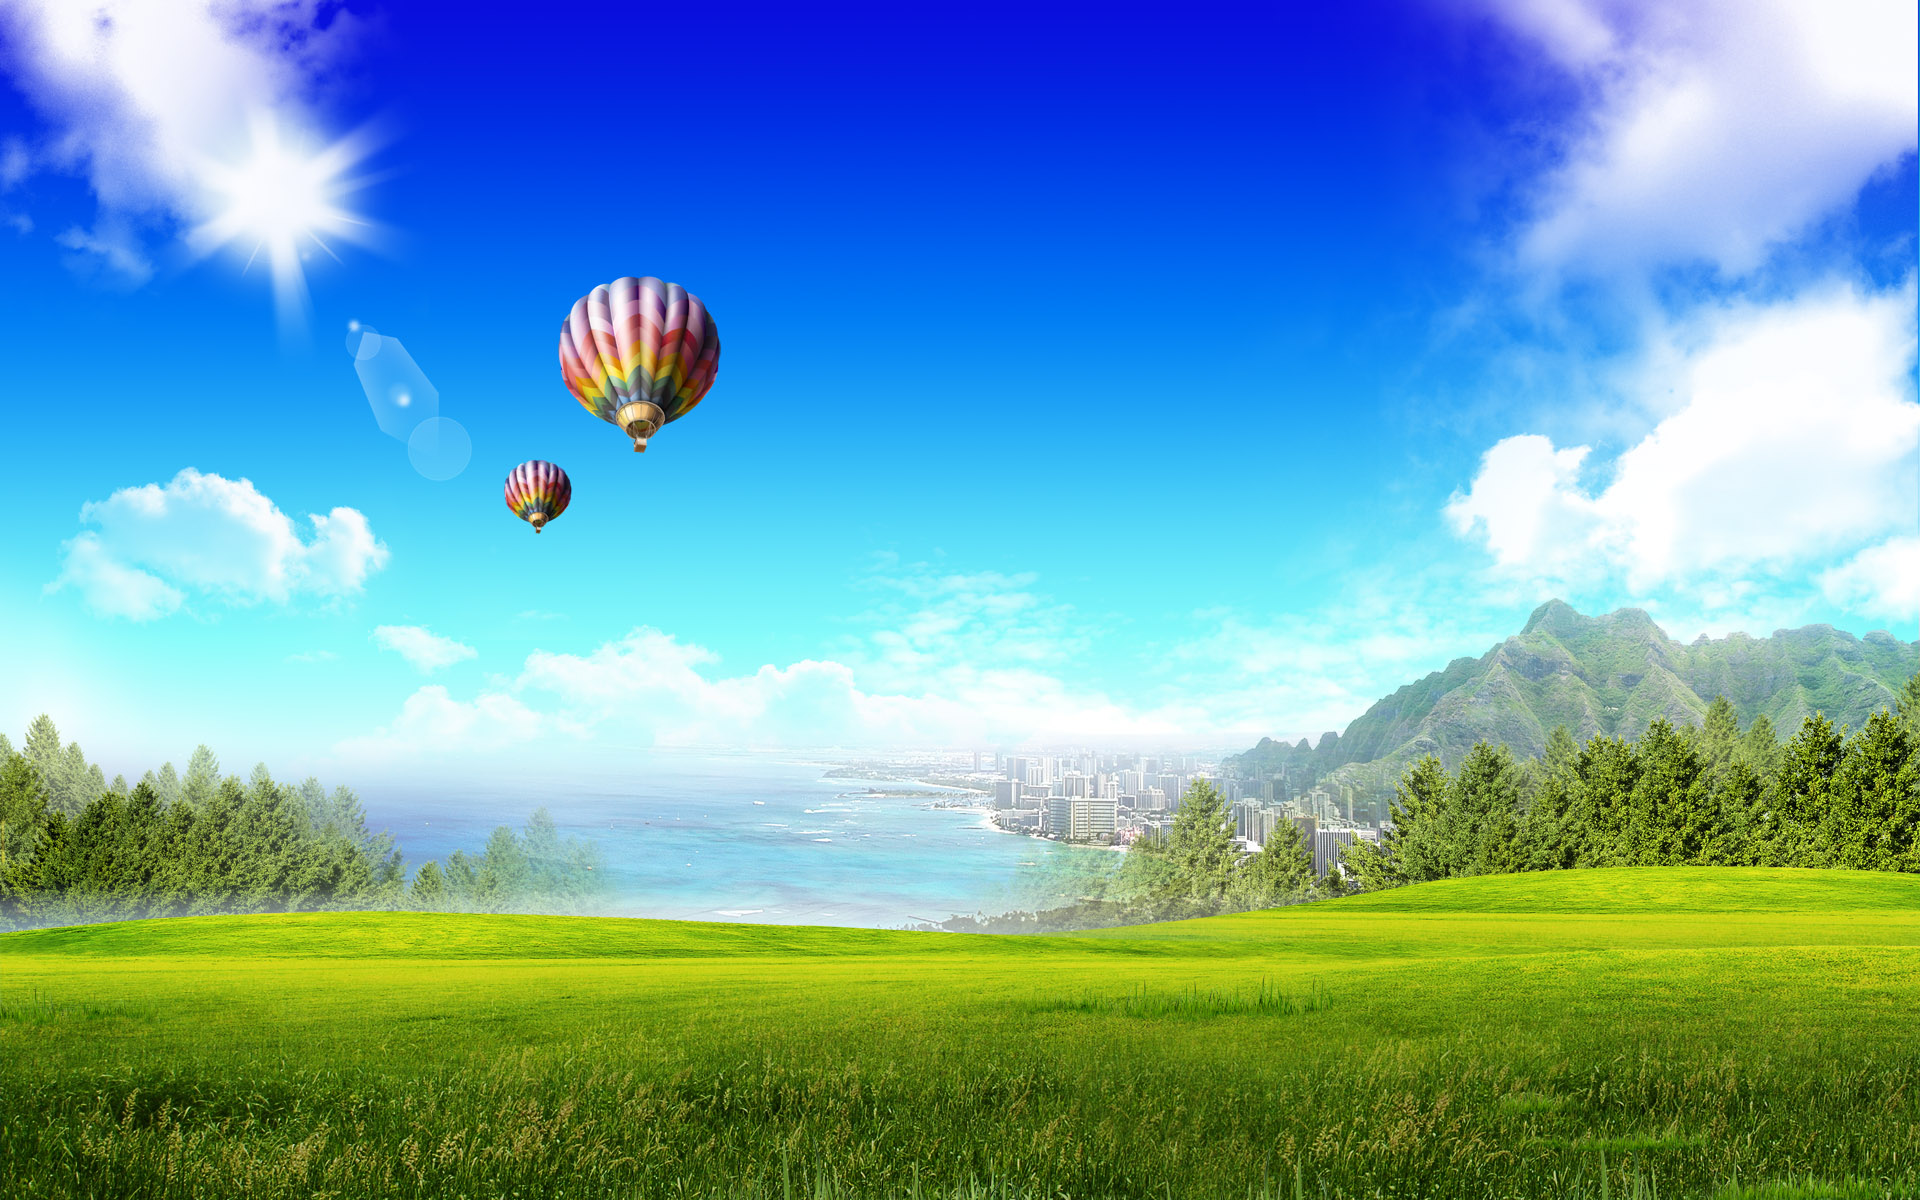 summer landscape image wallpaper - photo #33